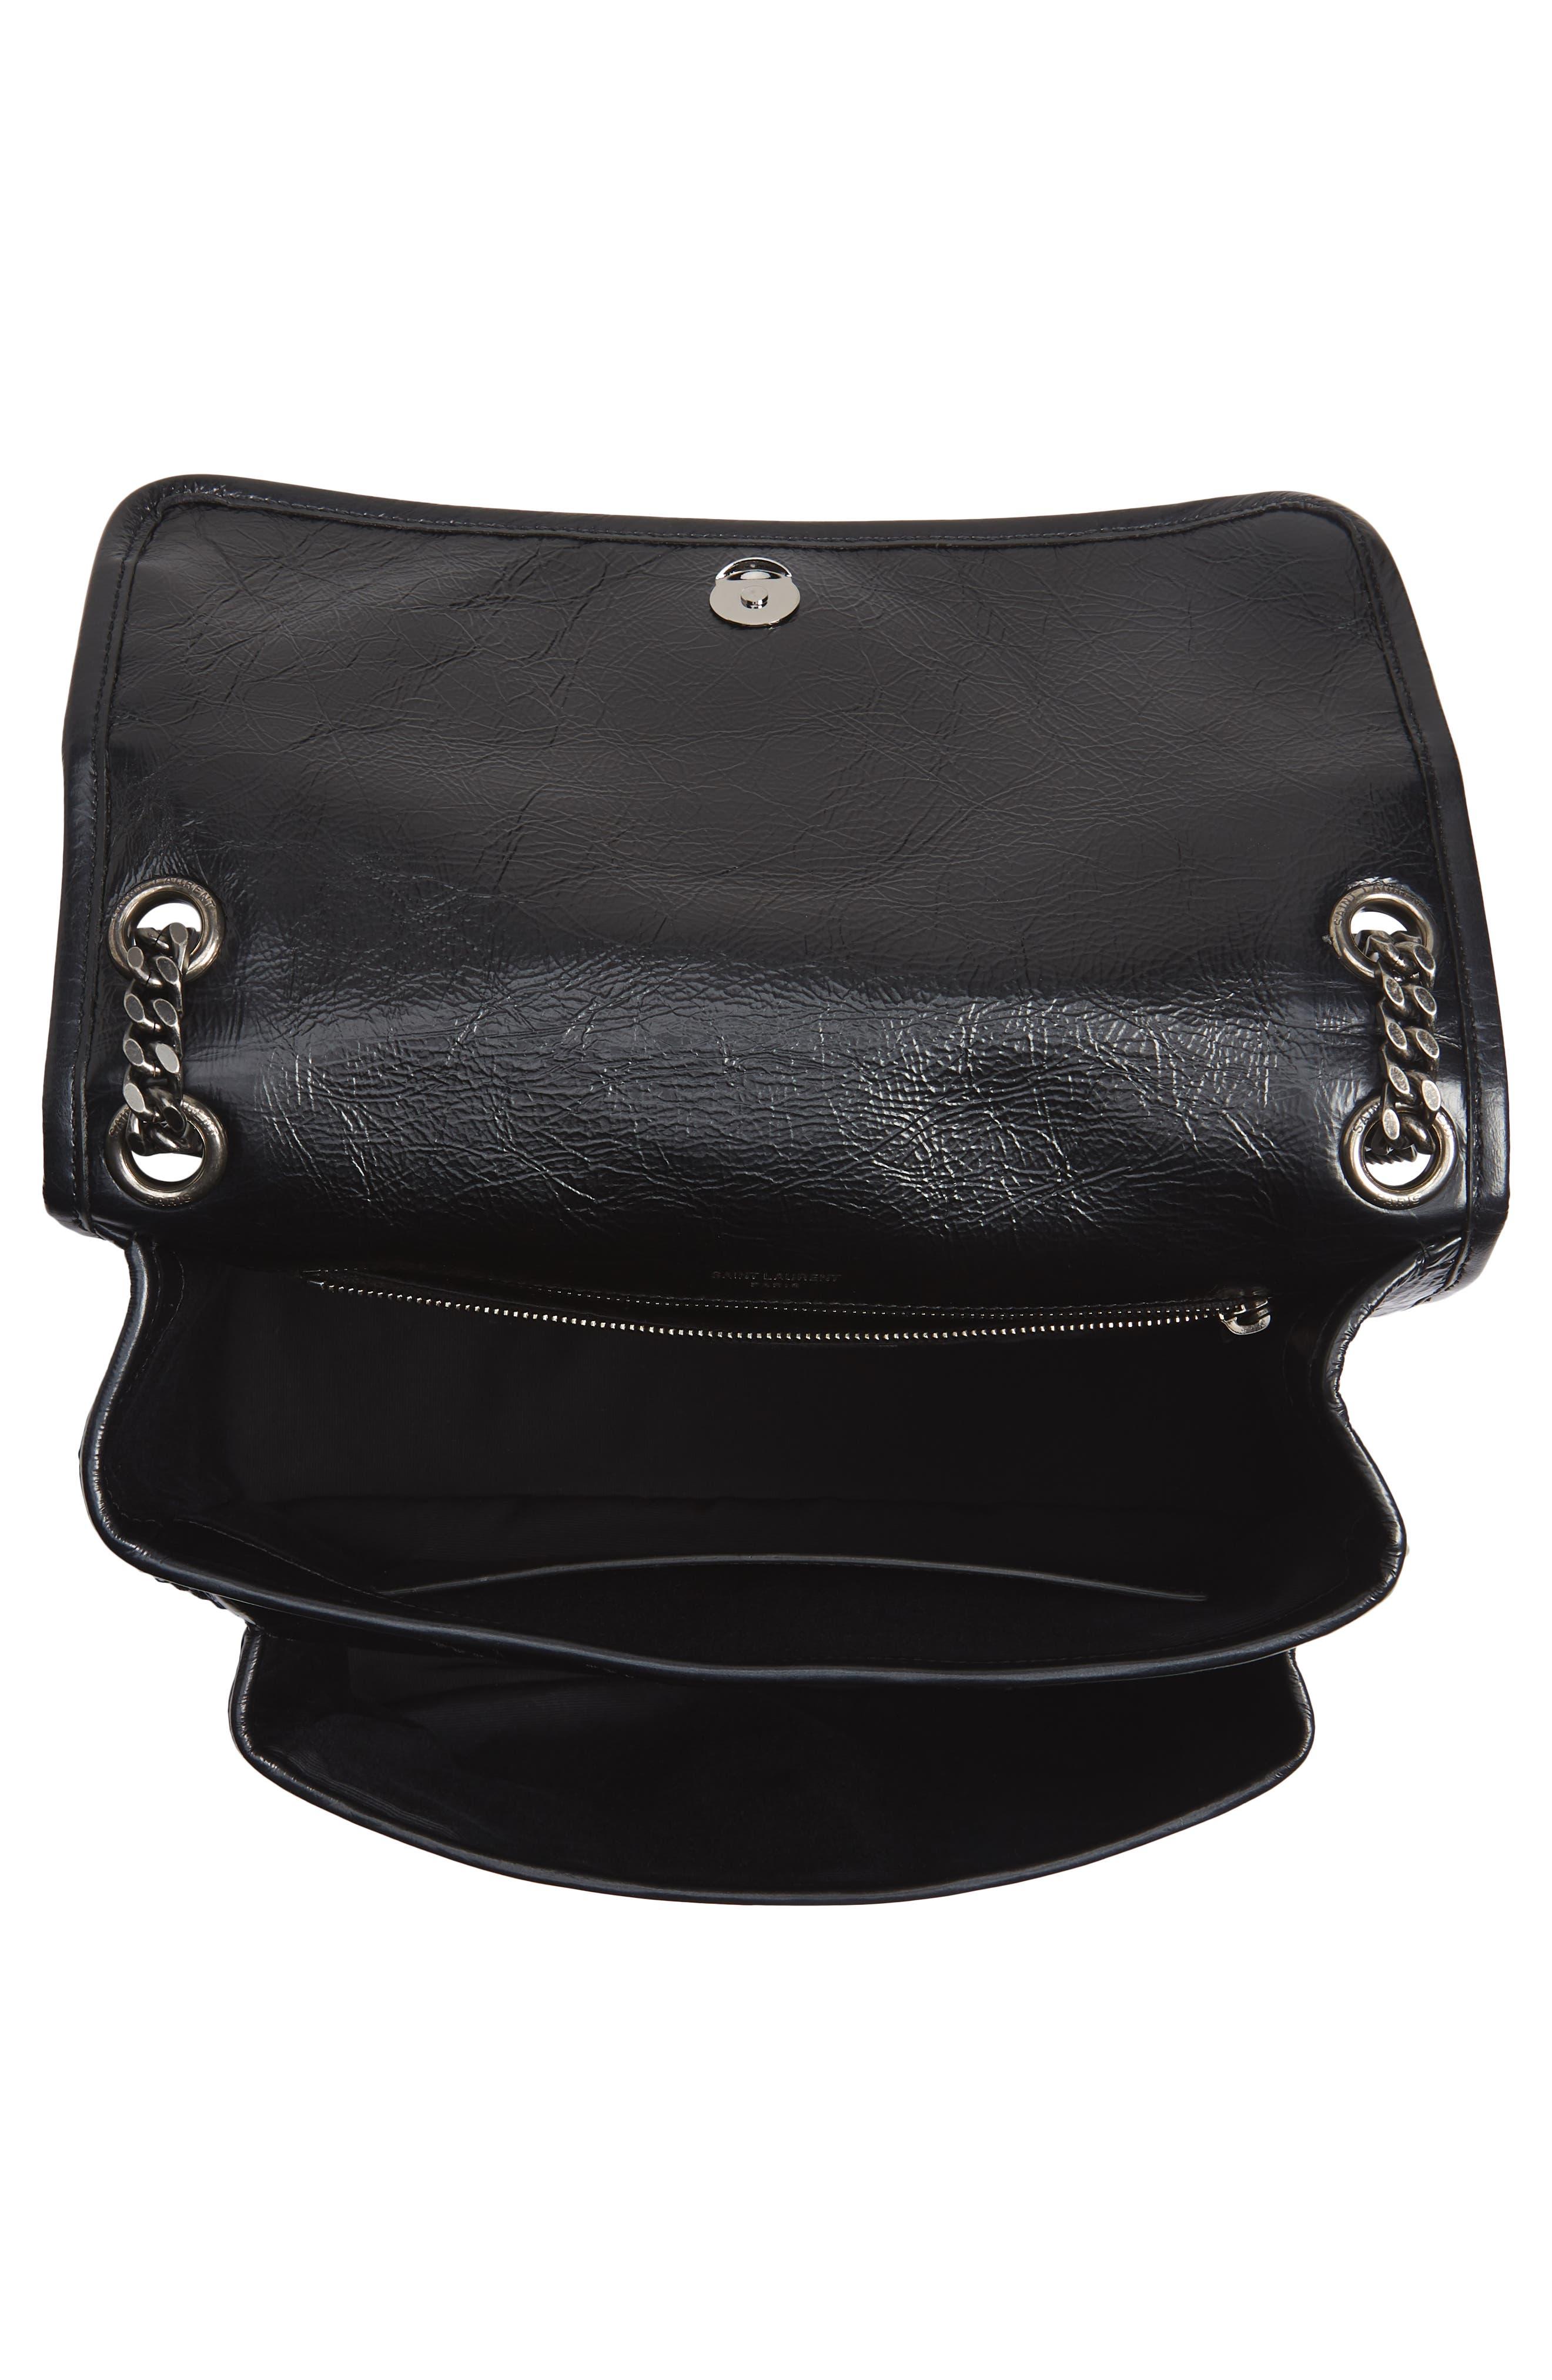 Medium Niki Leather Shoulder Bag,                             Alternate thumbnail 4, color,                             BLACK